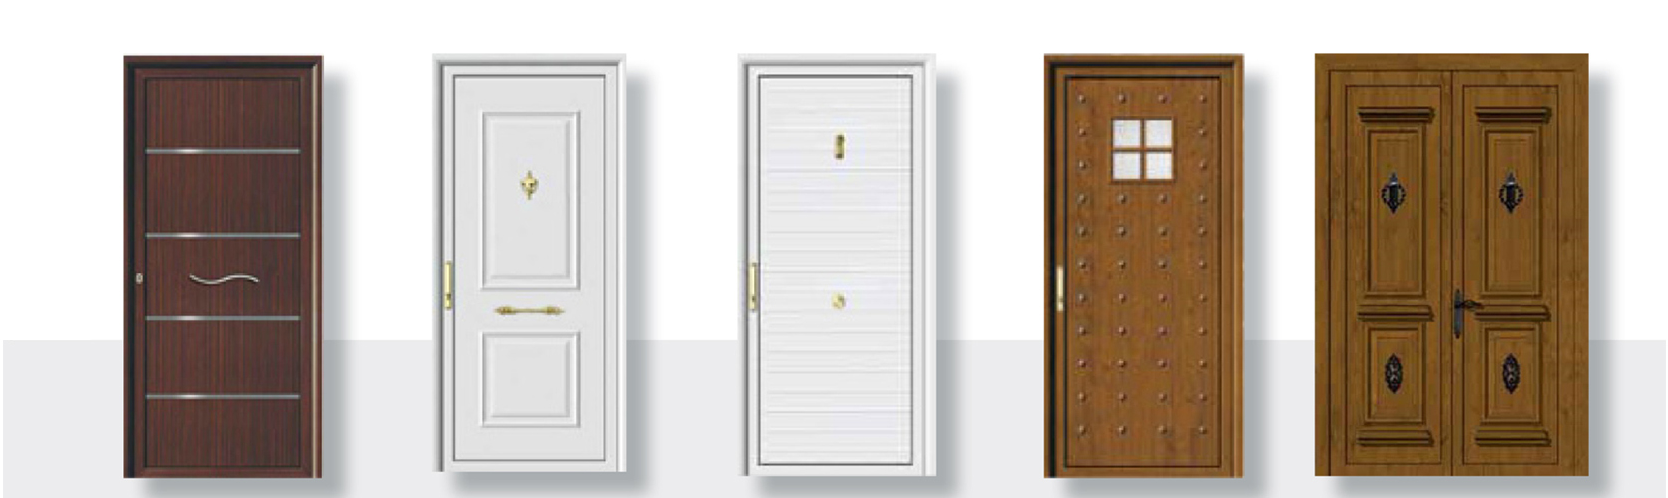 Puertas con acristalados o con panel